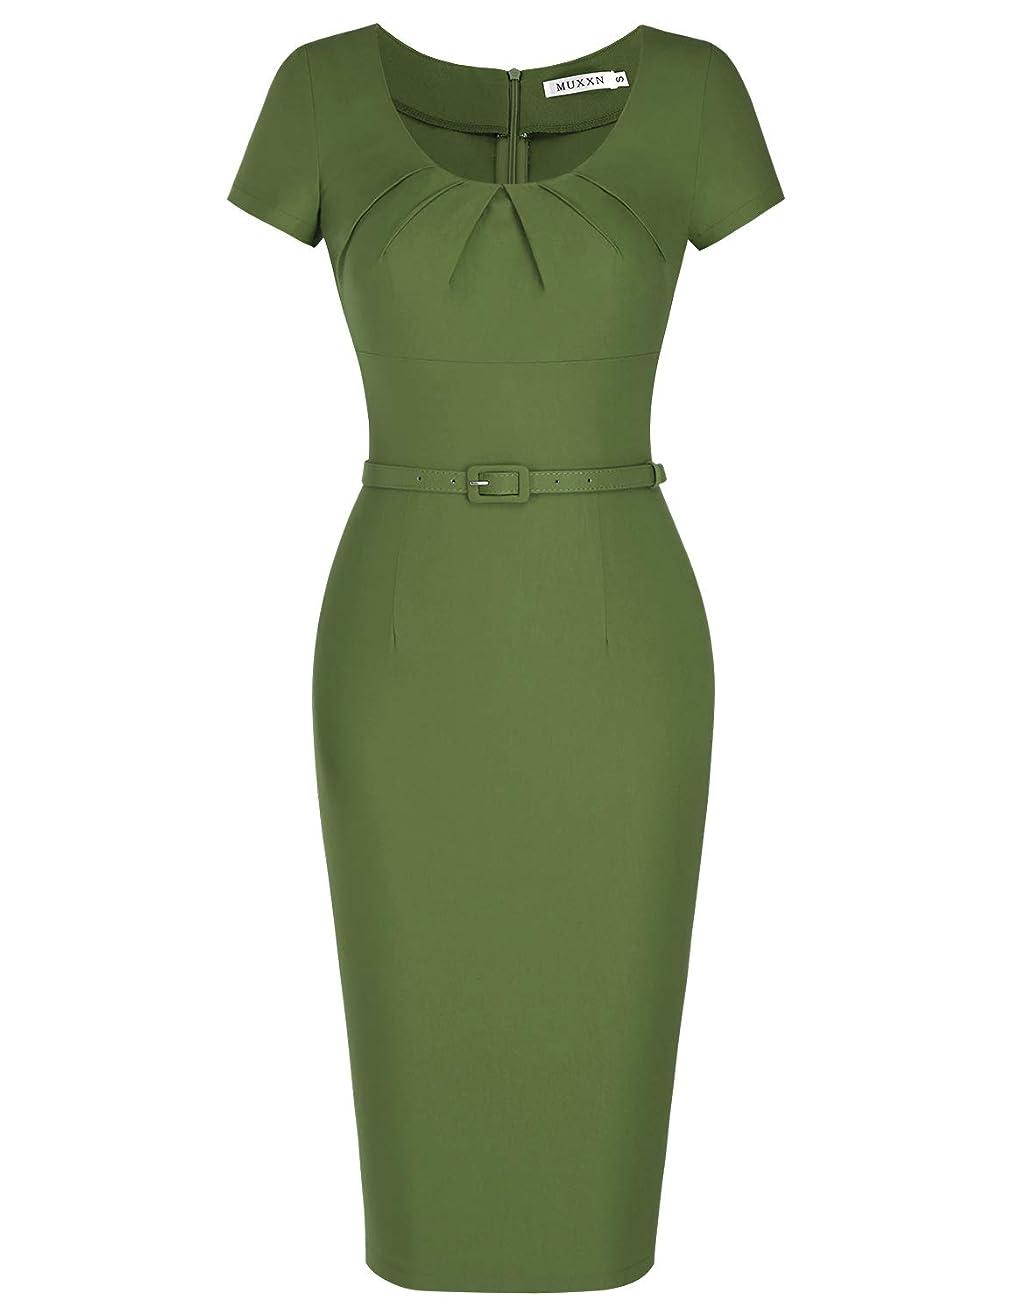 MUXXN Women's 1950s Vintage Short Sleeve Pleated Pencil Dress